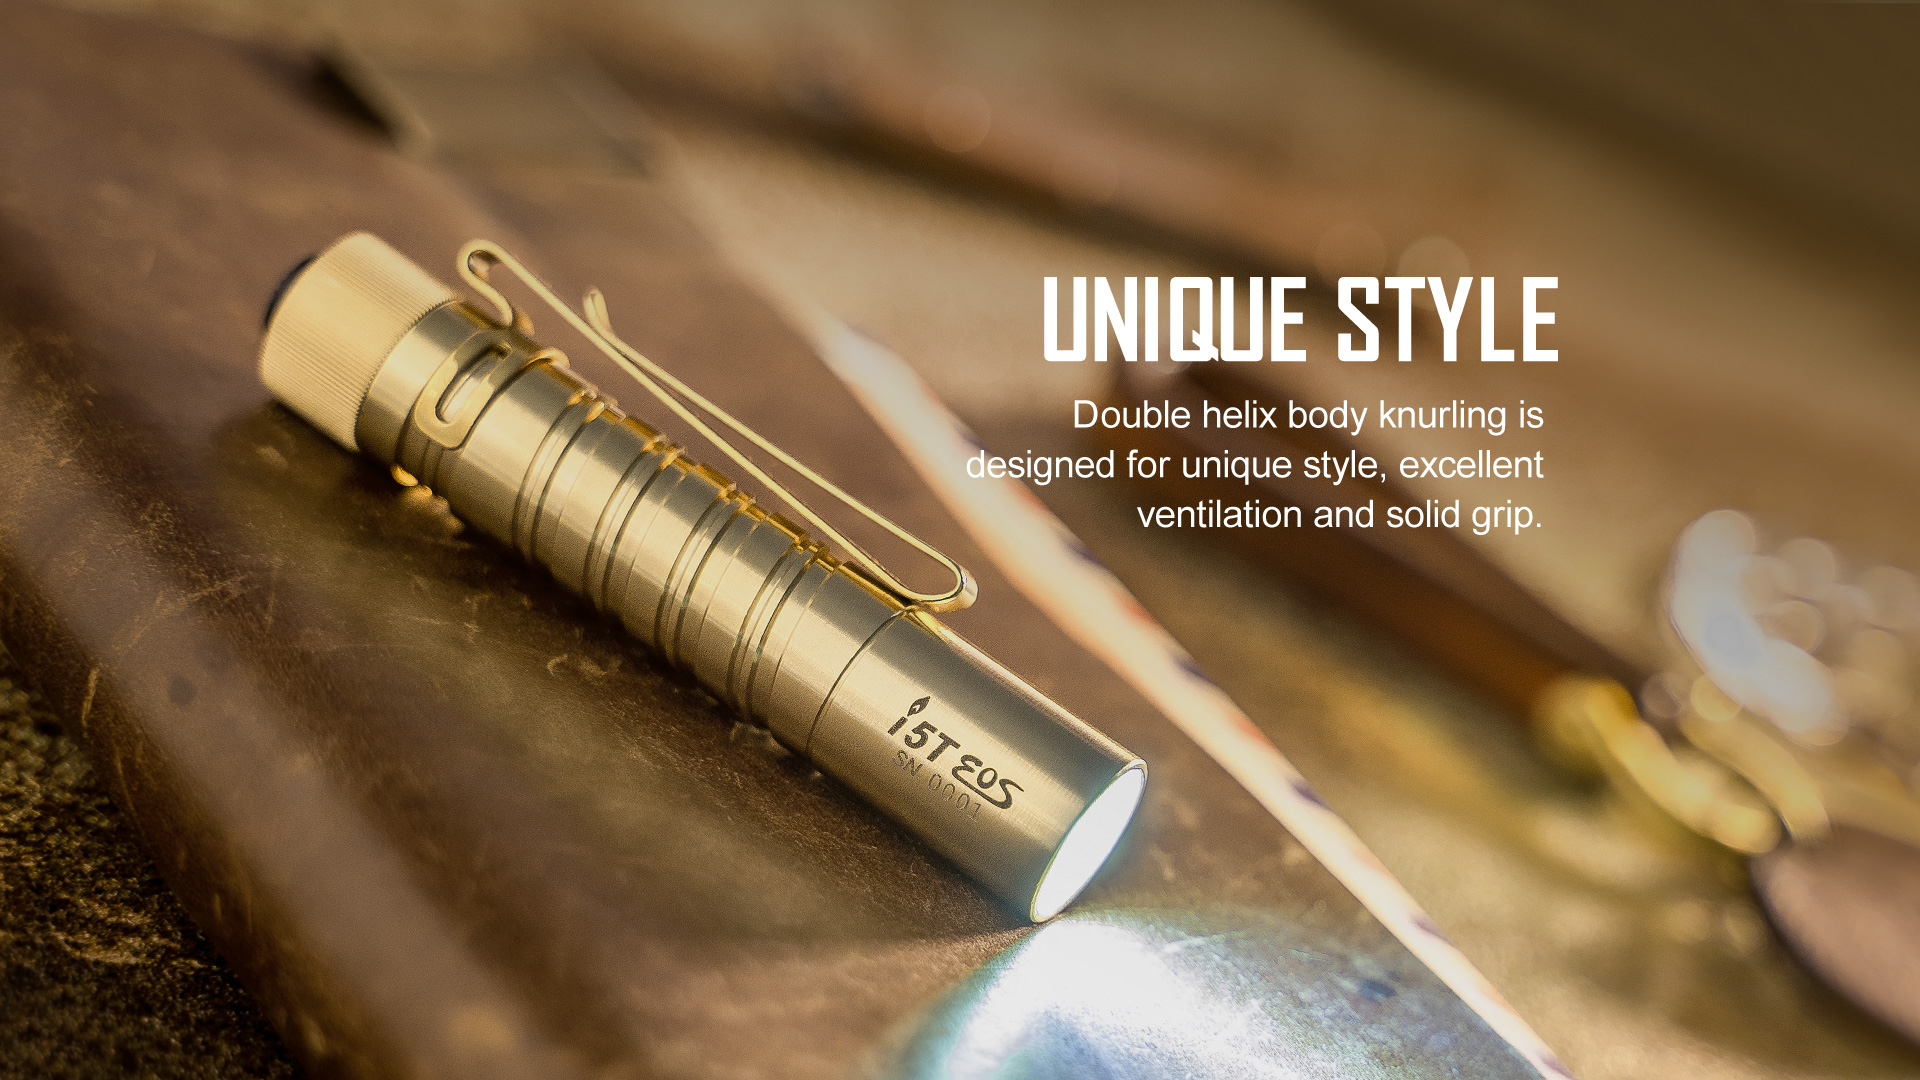 olight i5t,i5t brass,edc torch